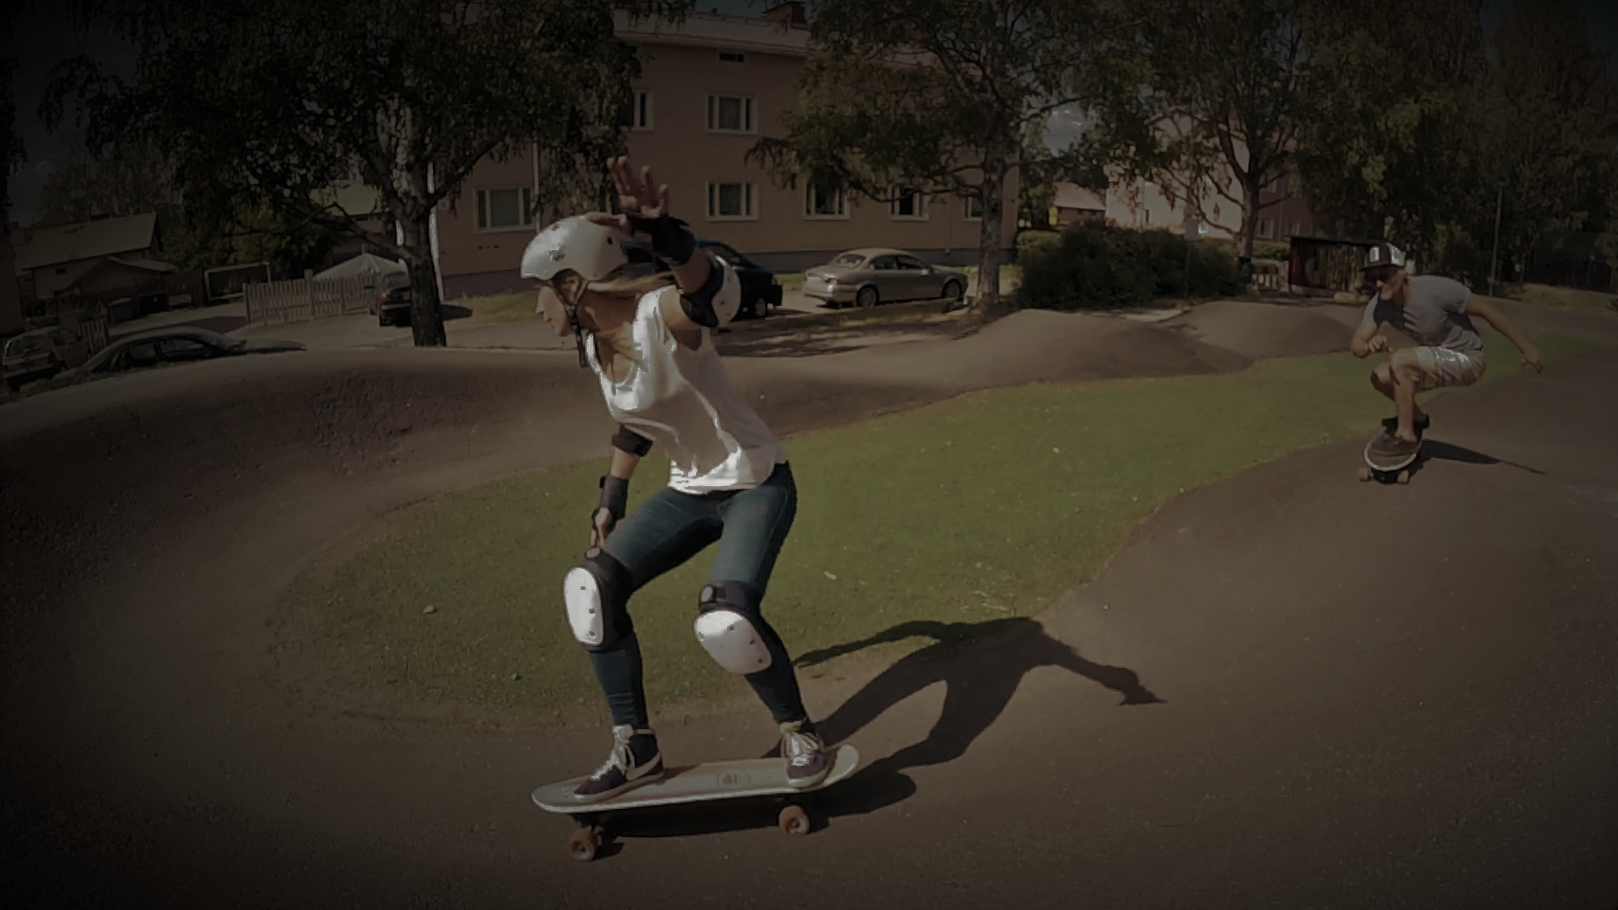 surfskate pumptrack